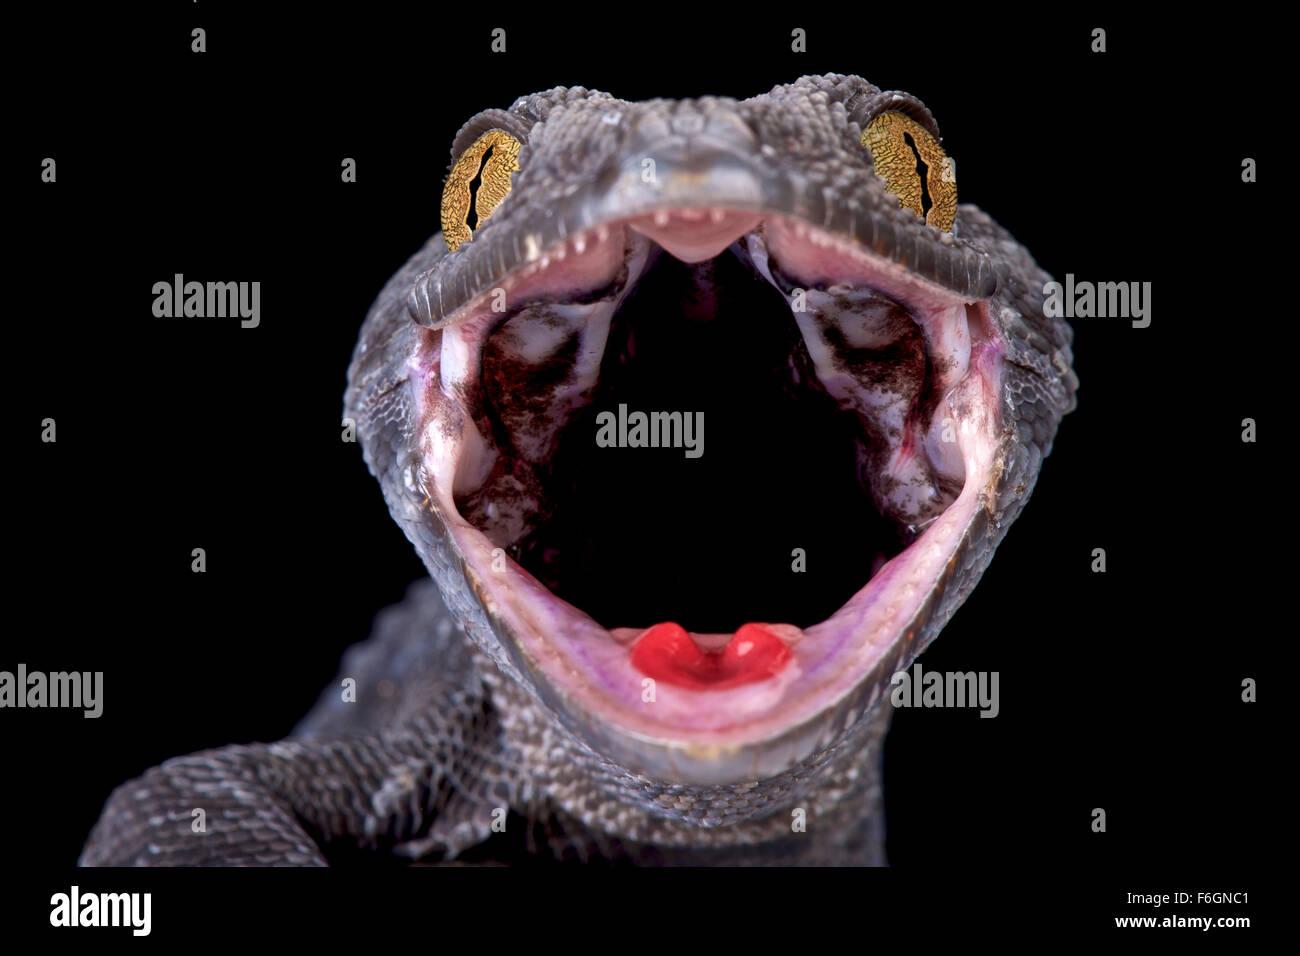 Tokeh (Gekko gecko) Immagini Stock